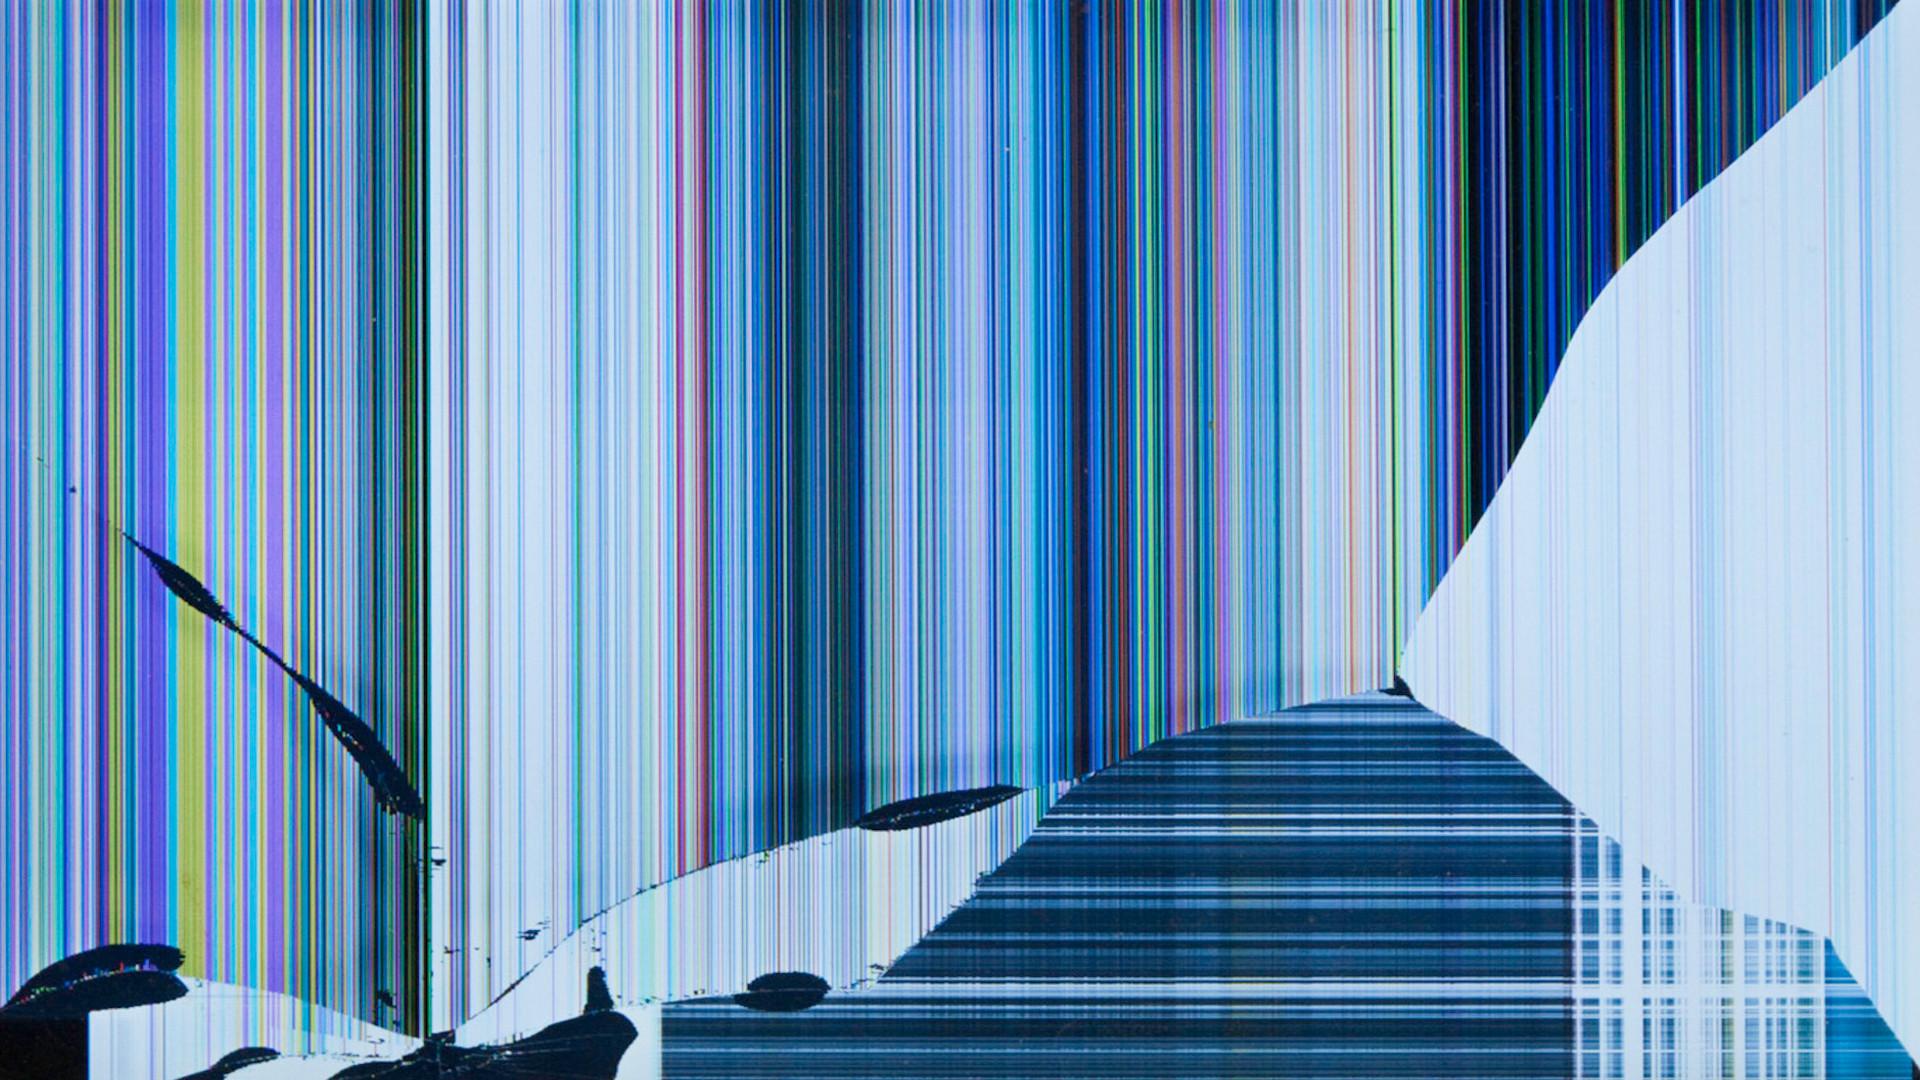 Cracked screen wallpaper windows 10 77 images 1920x1080 fake broken screen for windows 7810 voltagebd Images